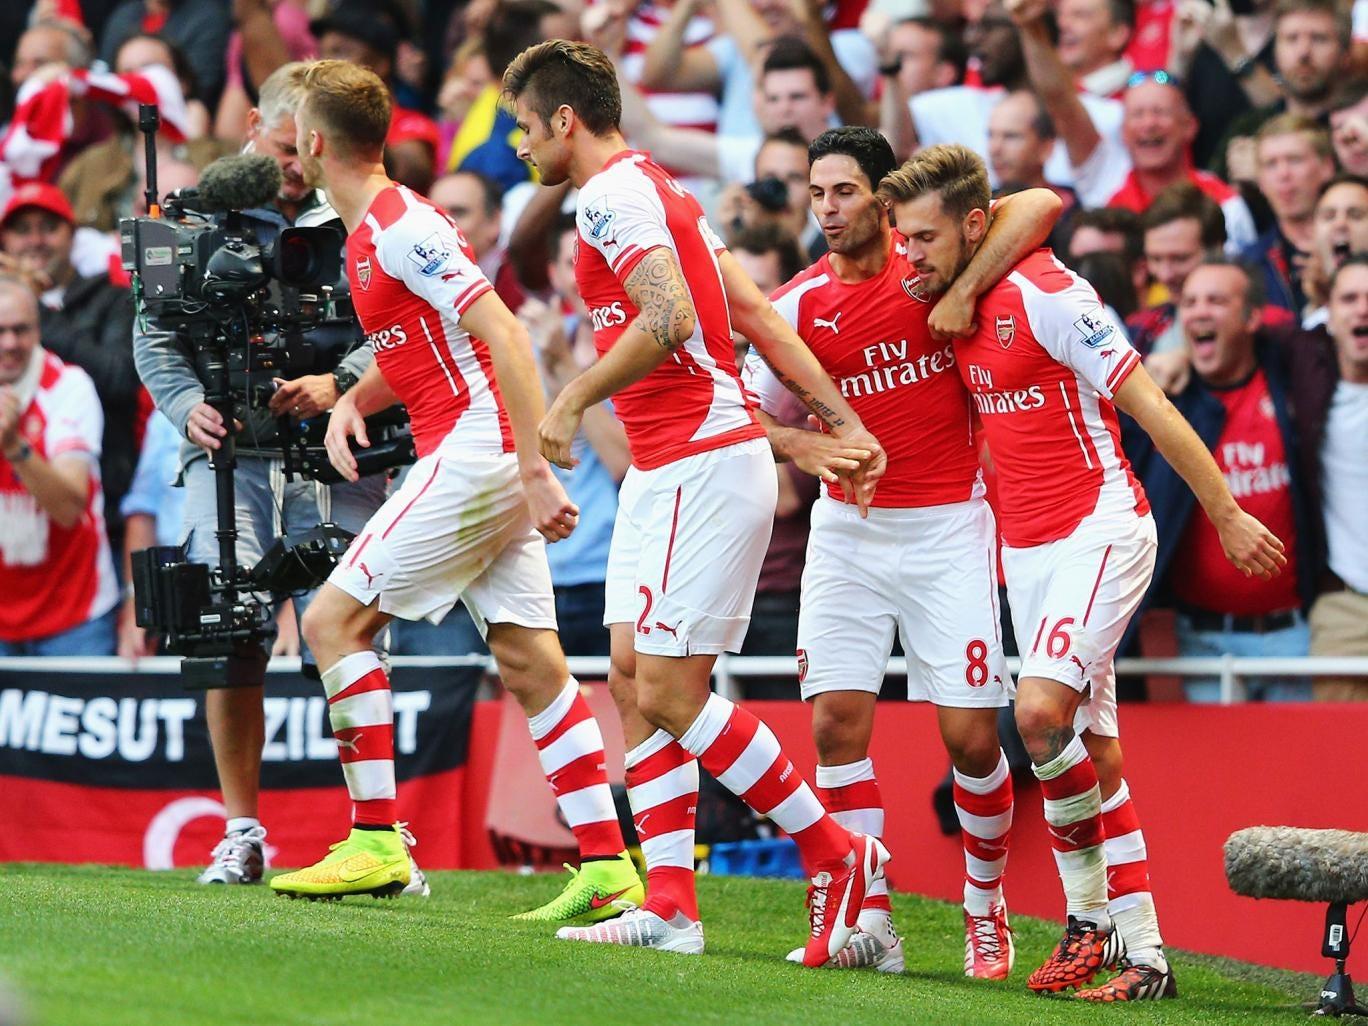 Arsenal celebrate Aaron Ramsey's late winning goal to make it 2-1